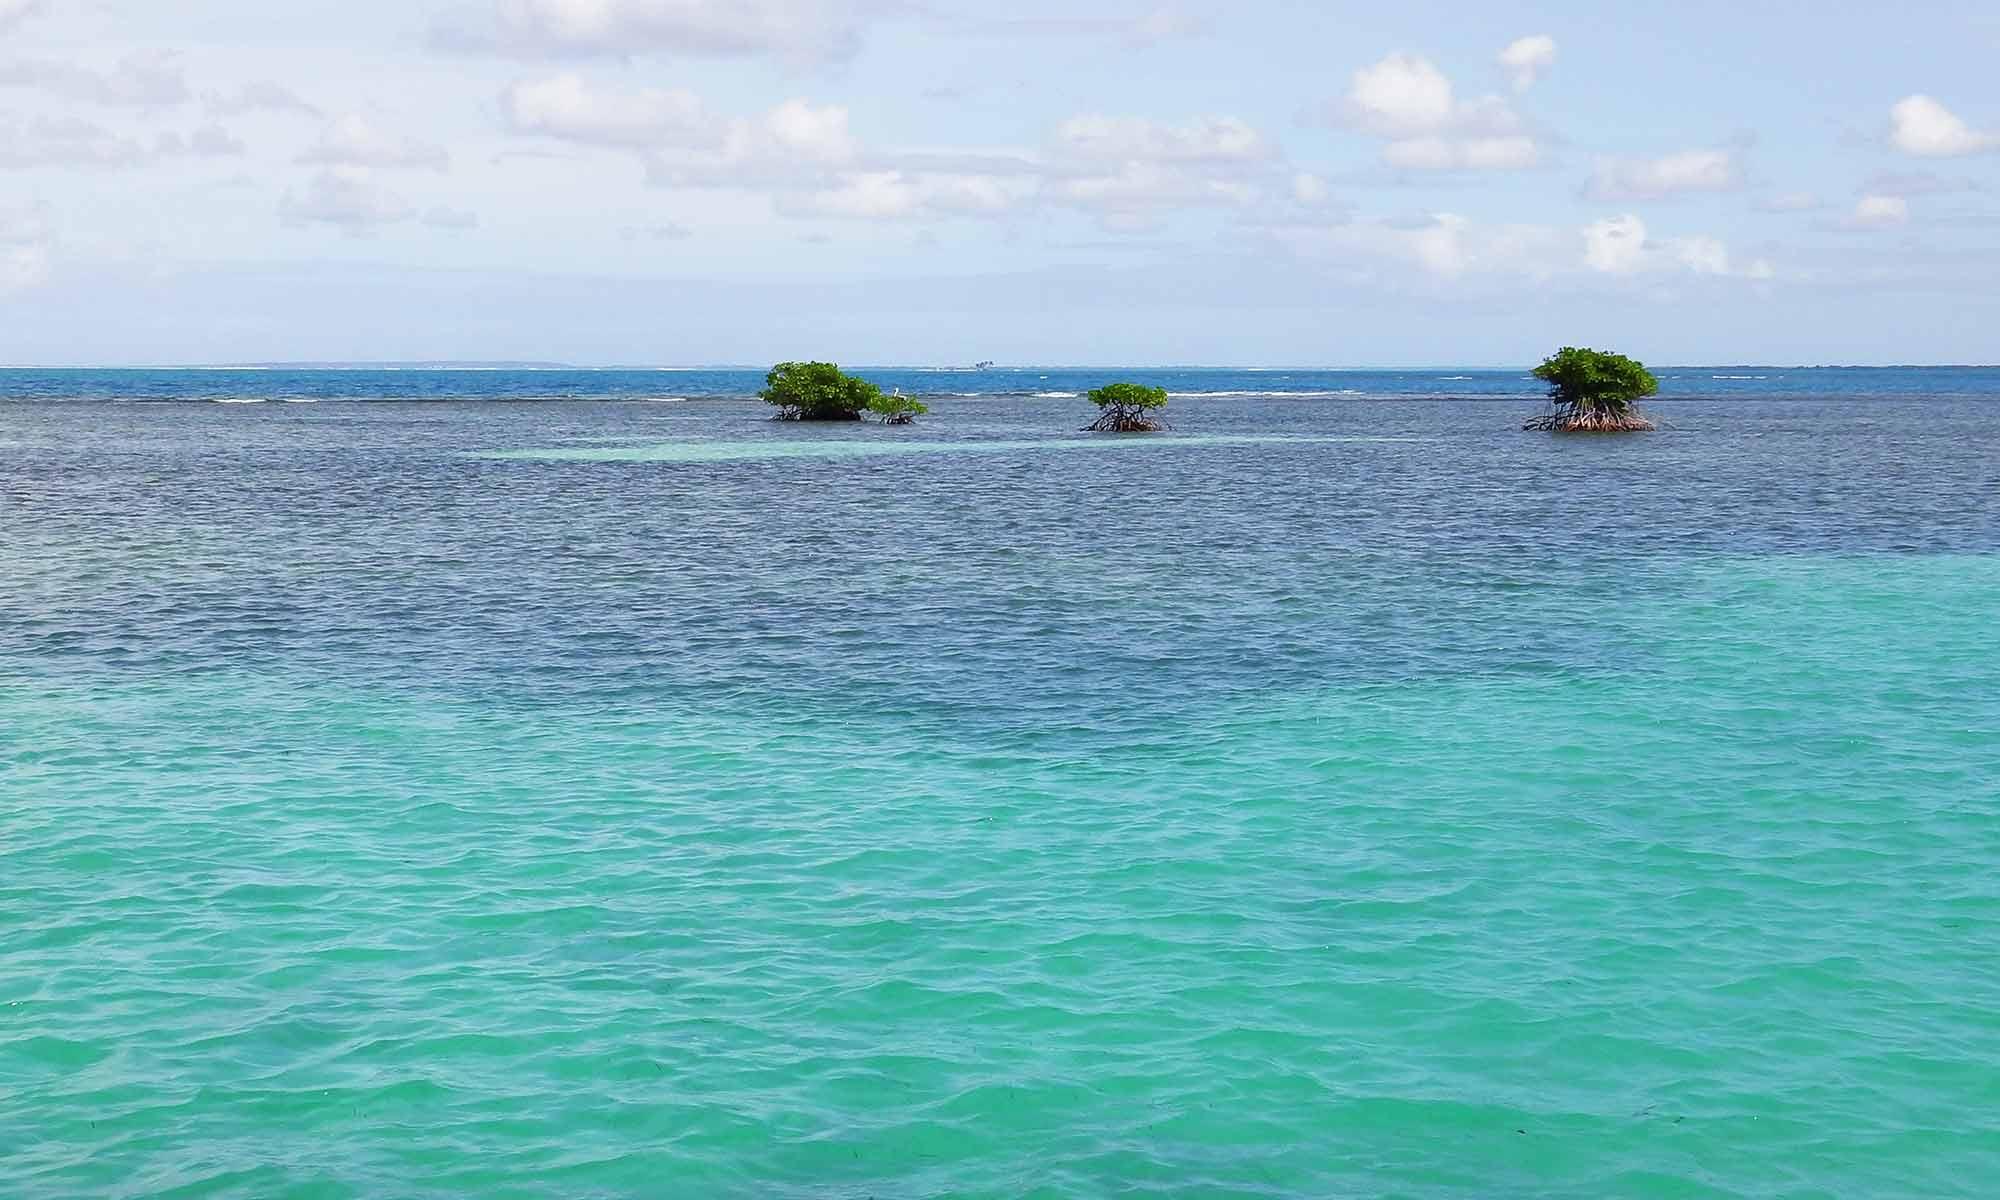 îlots de palétuviers